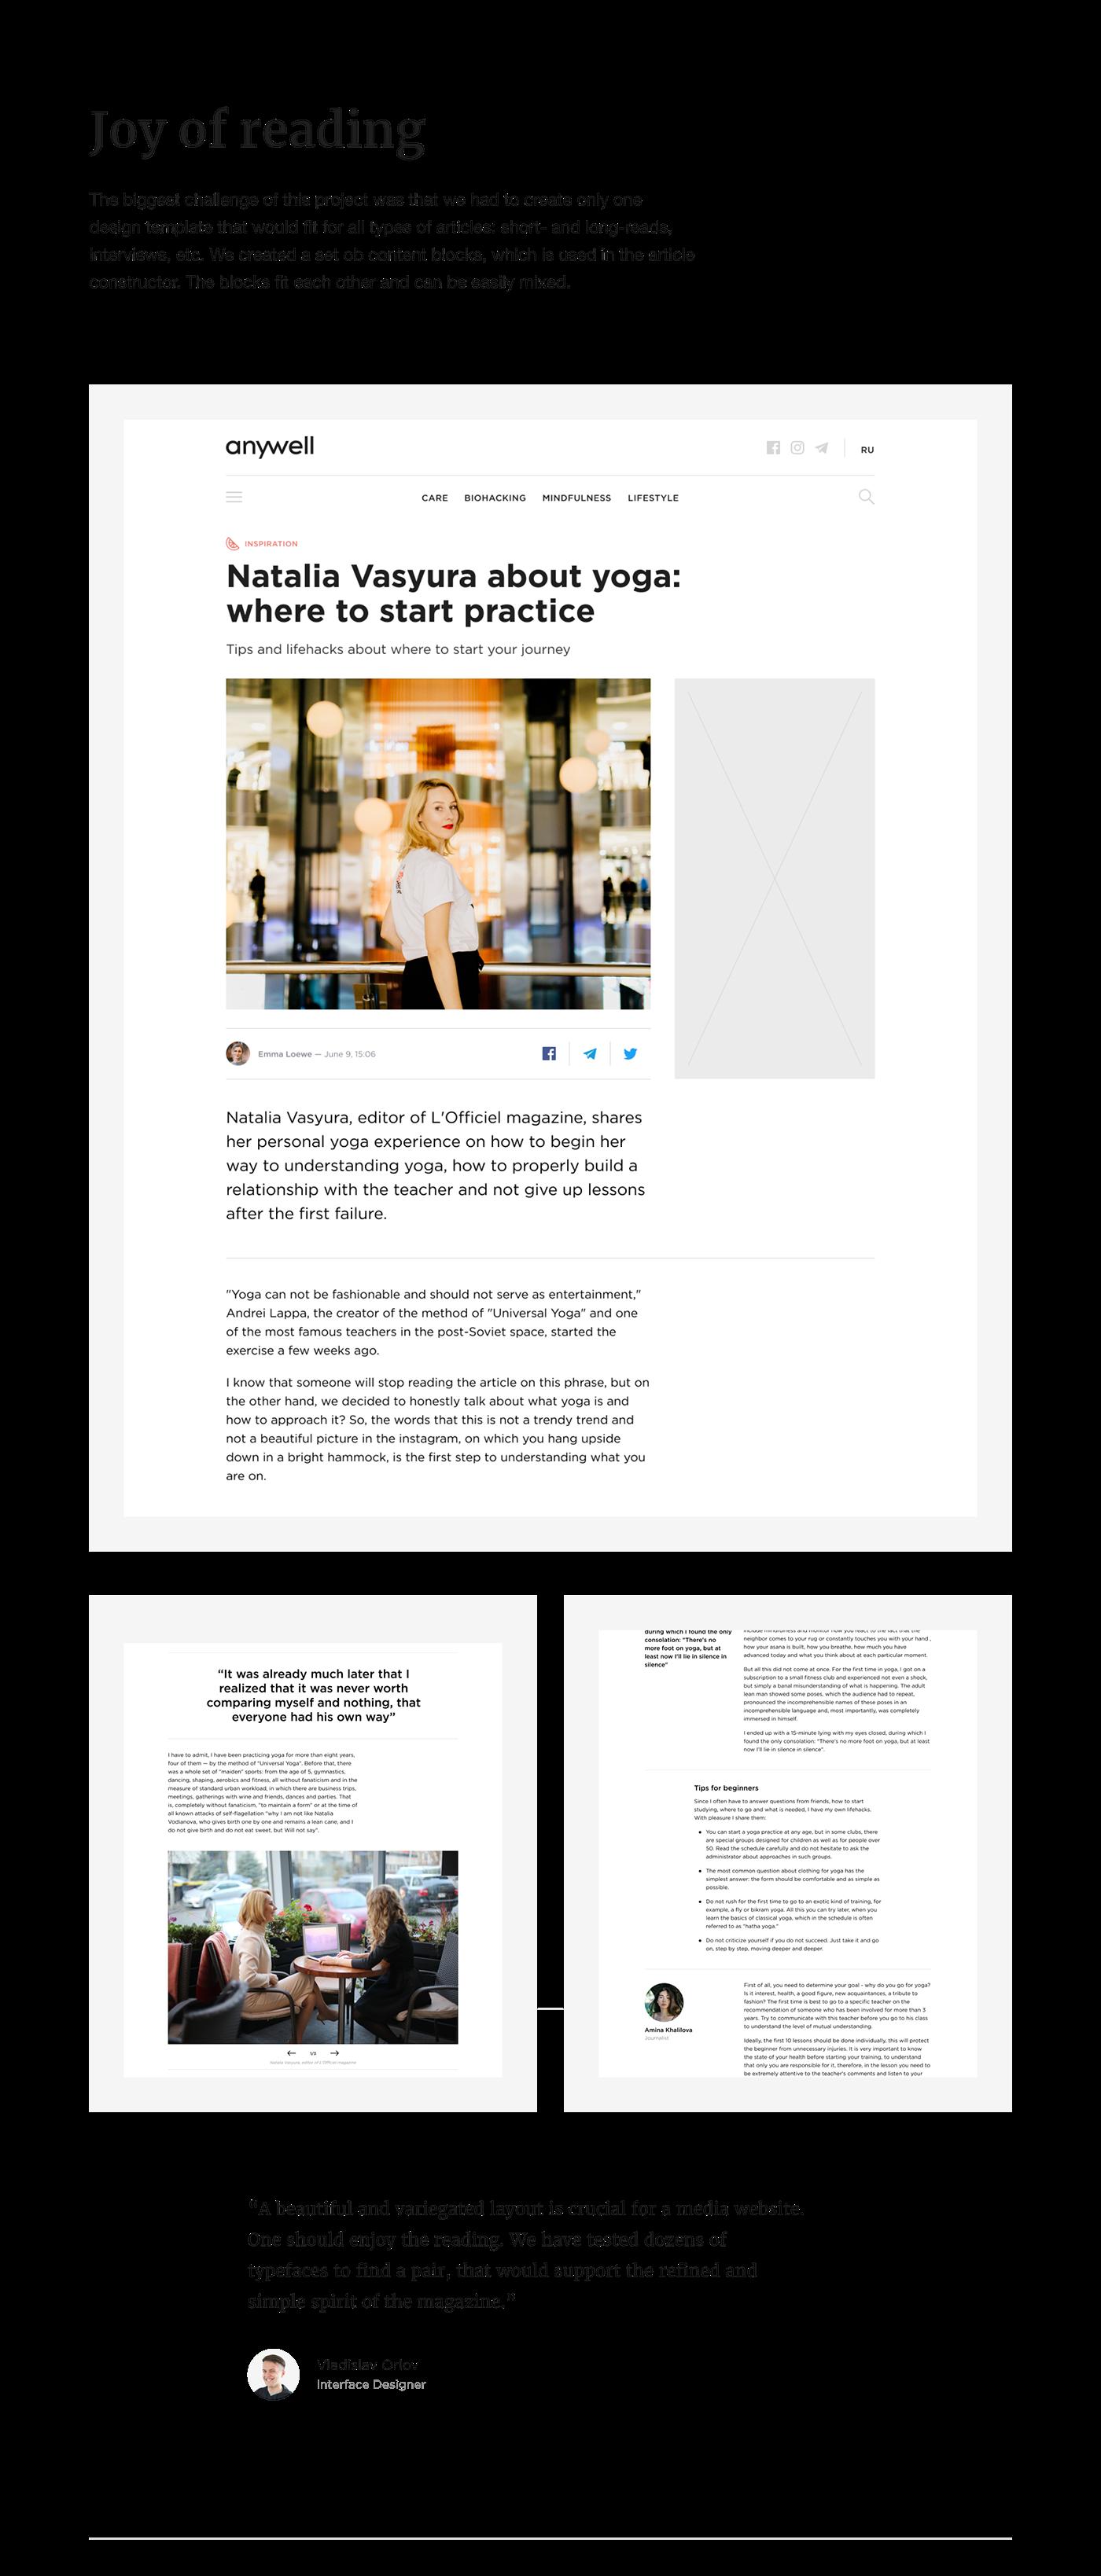 media magazine fitness Health beauty Blog Wellness cosmetics wellbeing Fashion